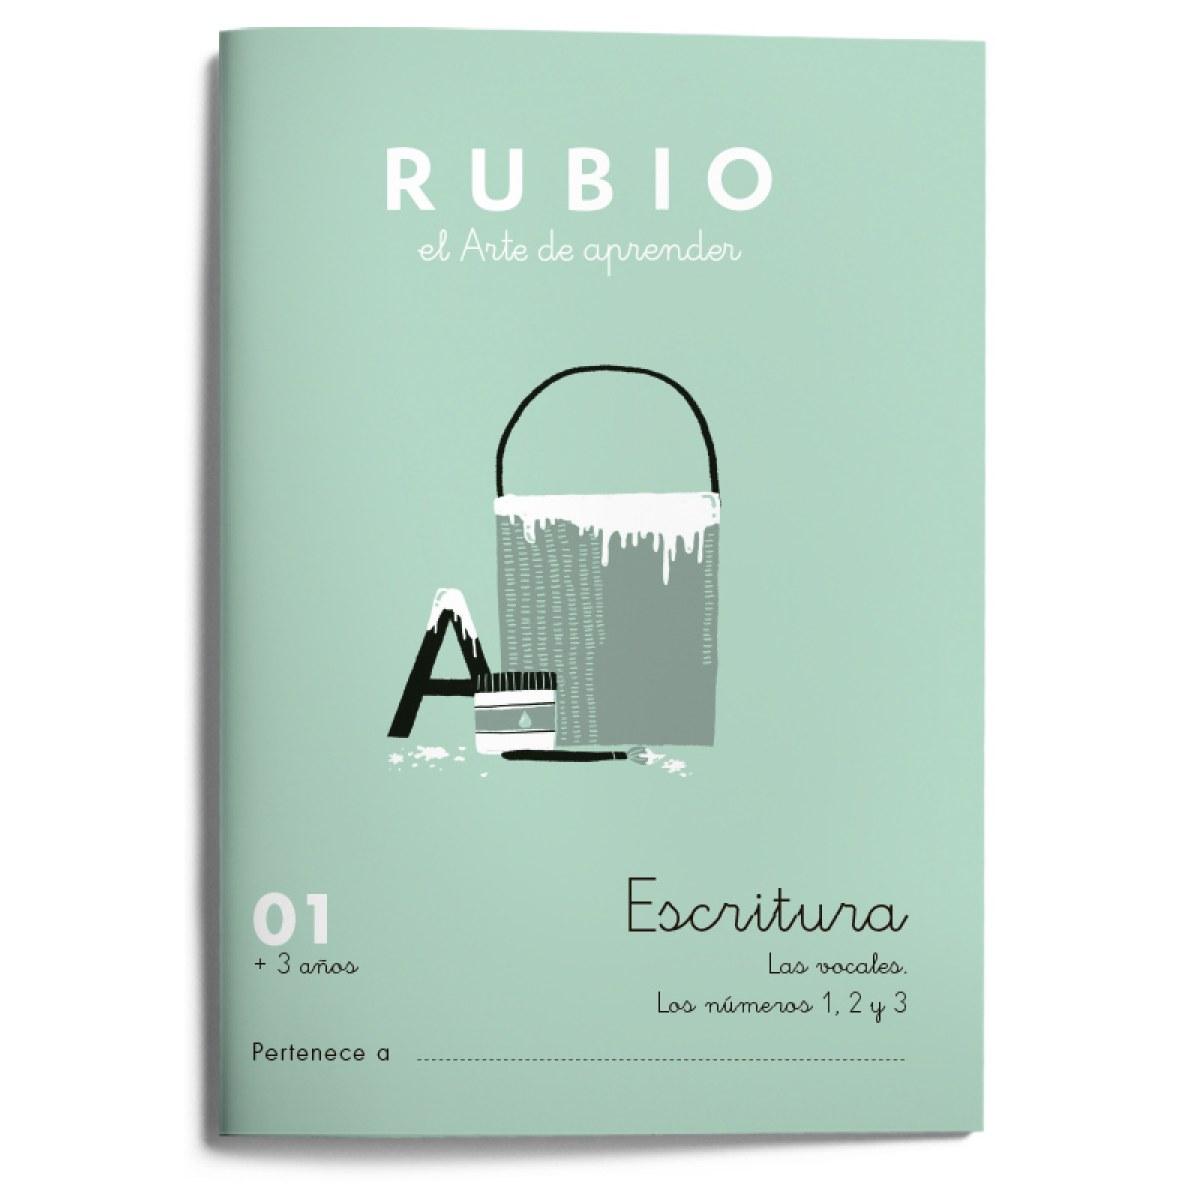 ESCRITURA RUBIO 01